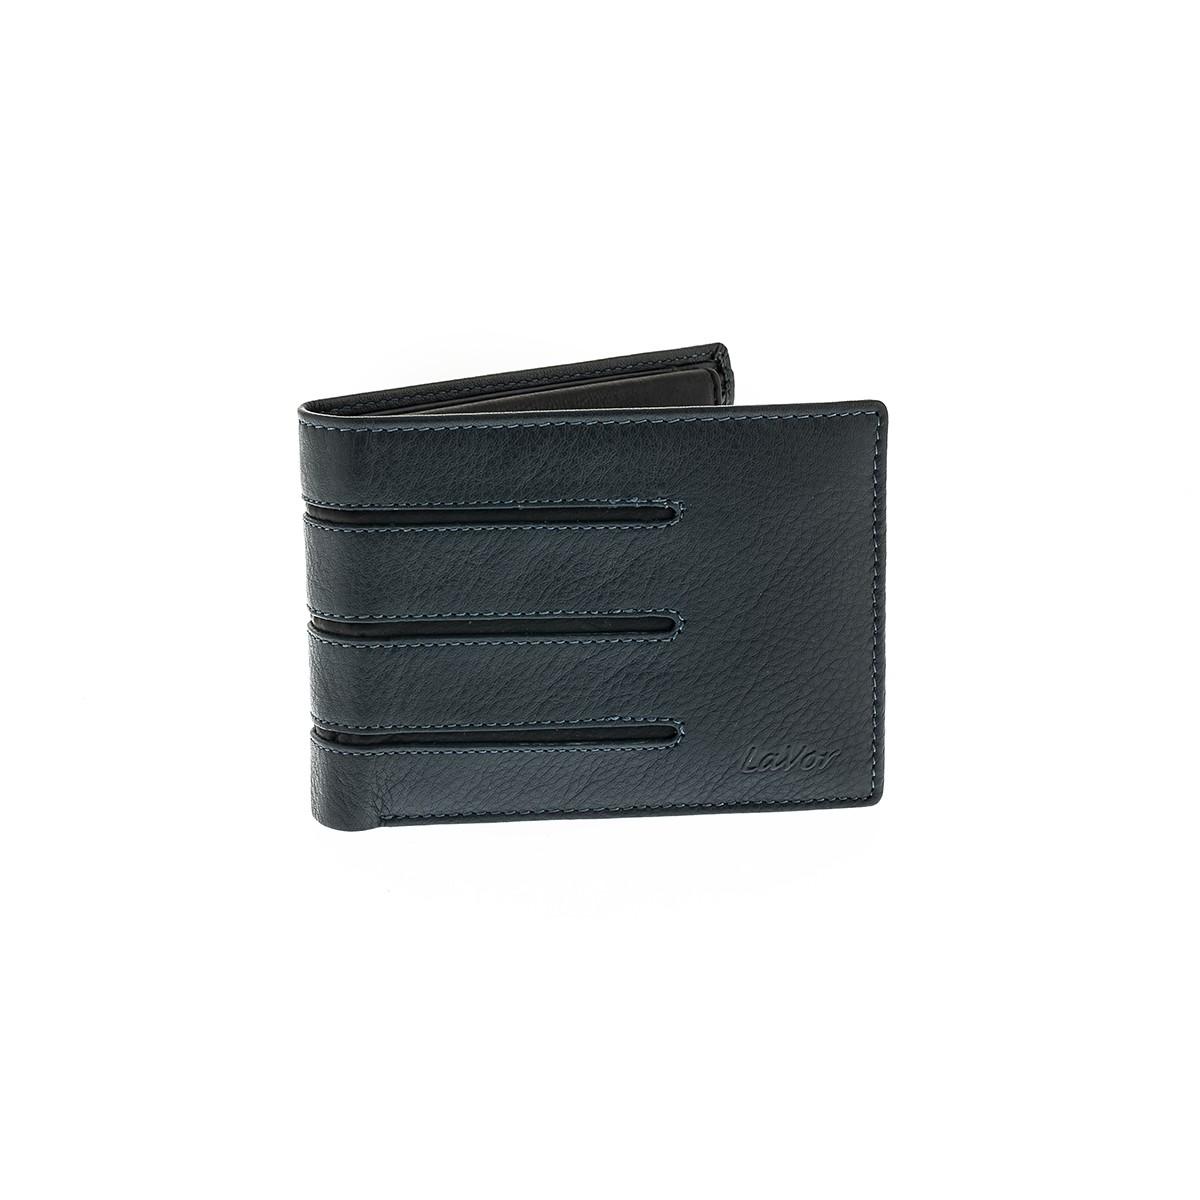 Bagsin-Lavor-5615-01-black